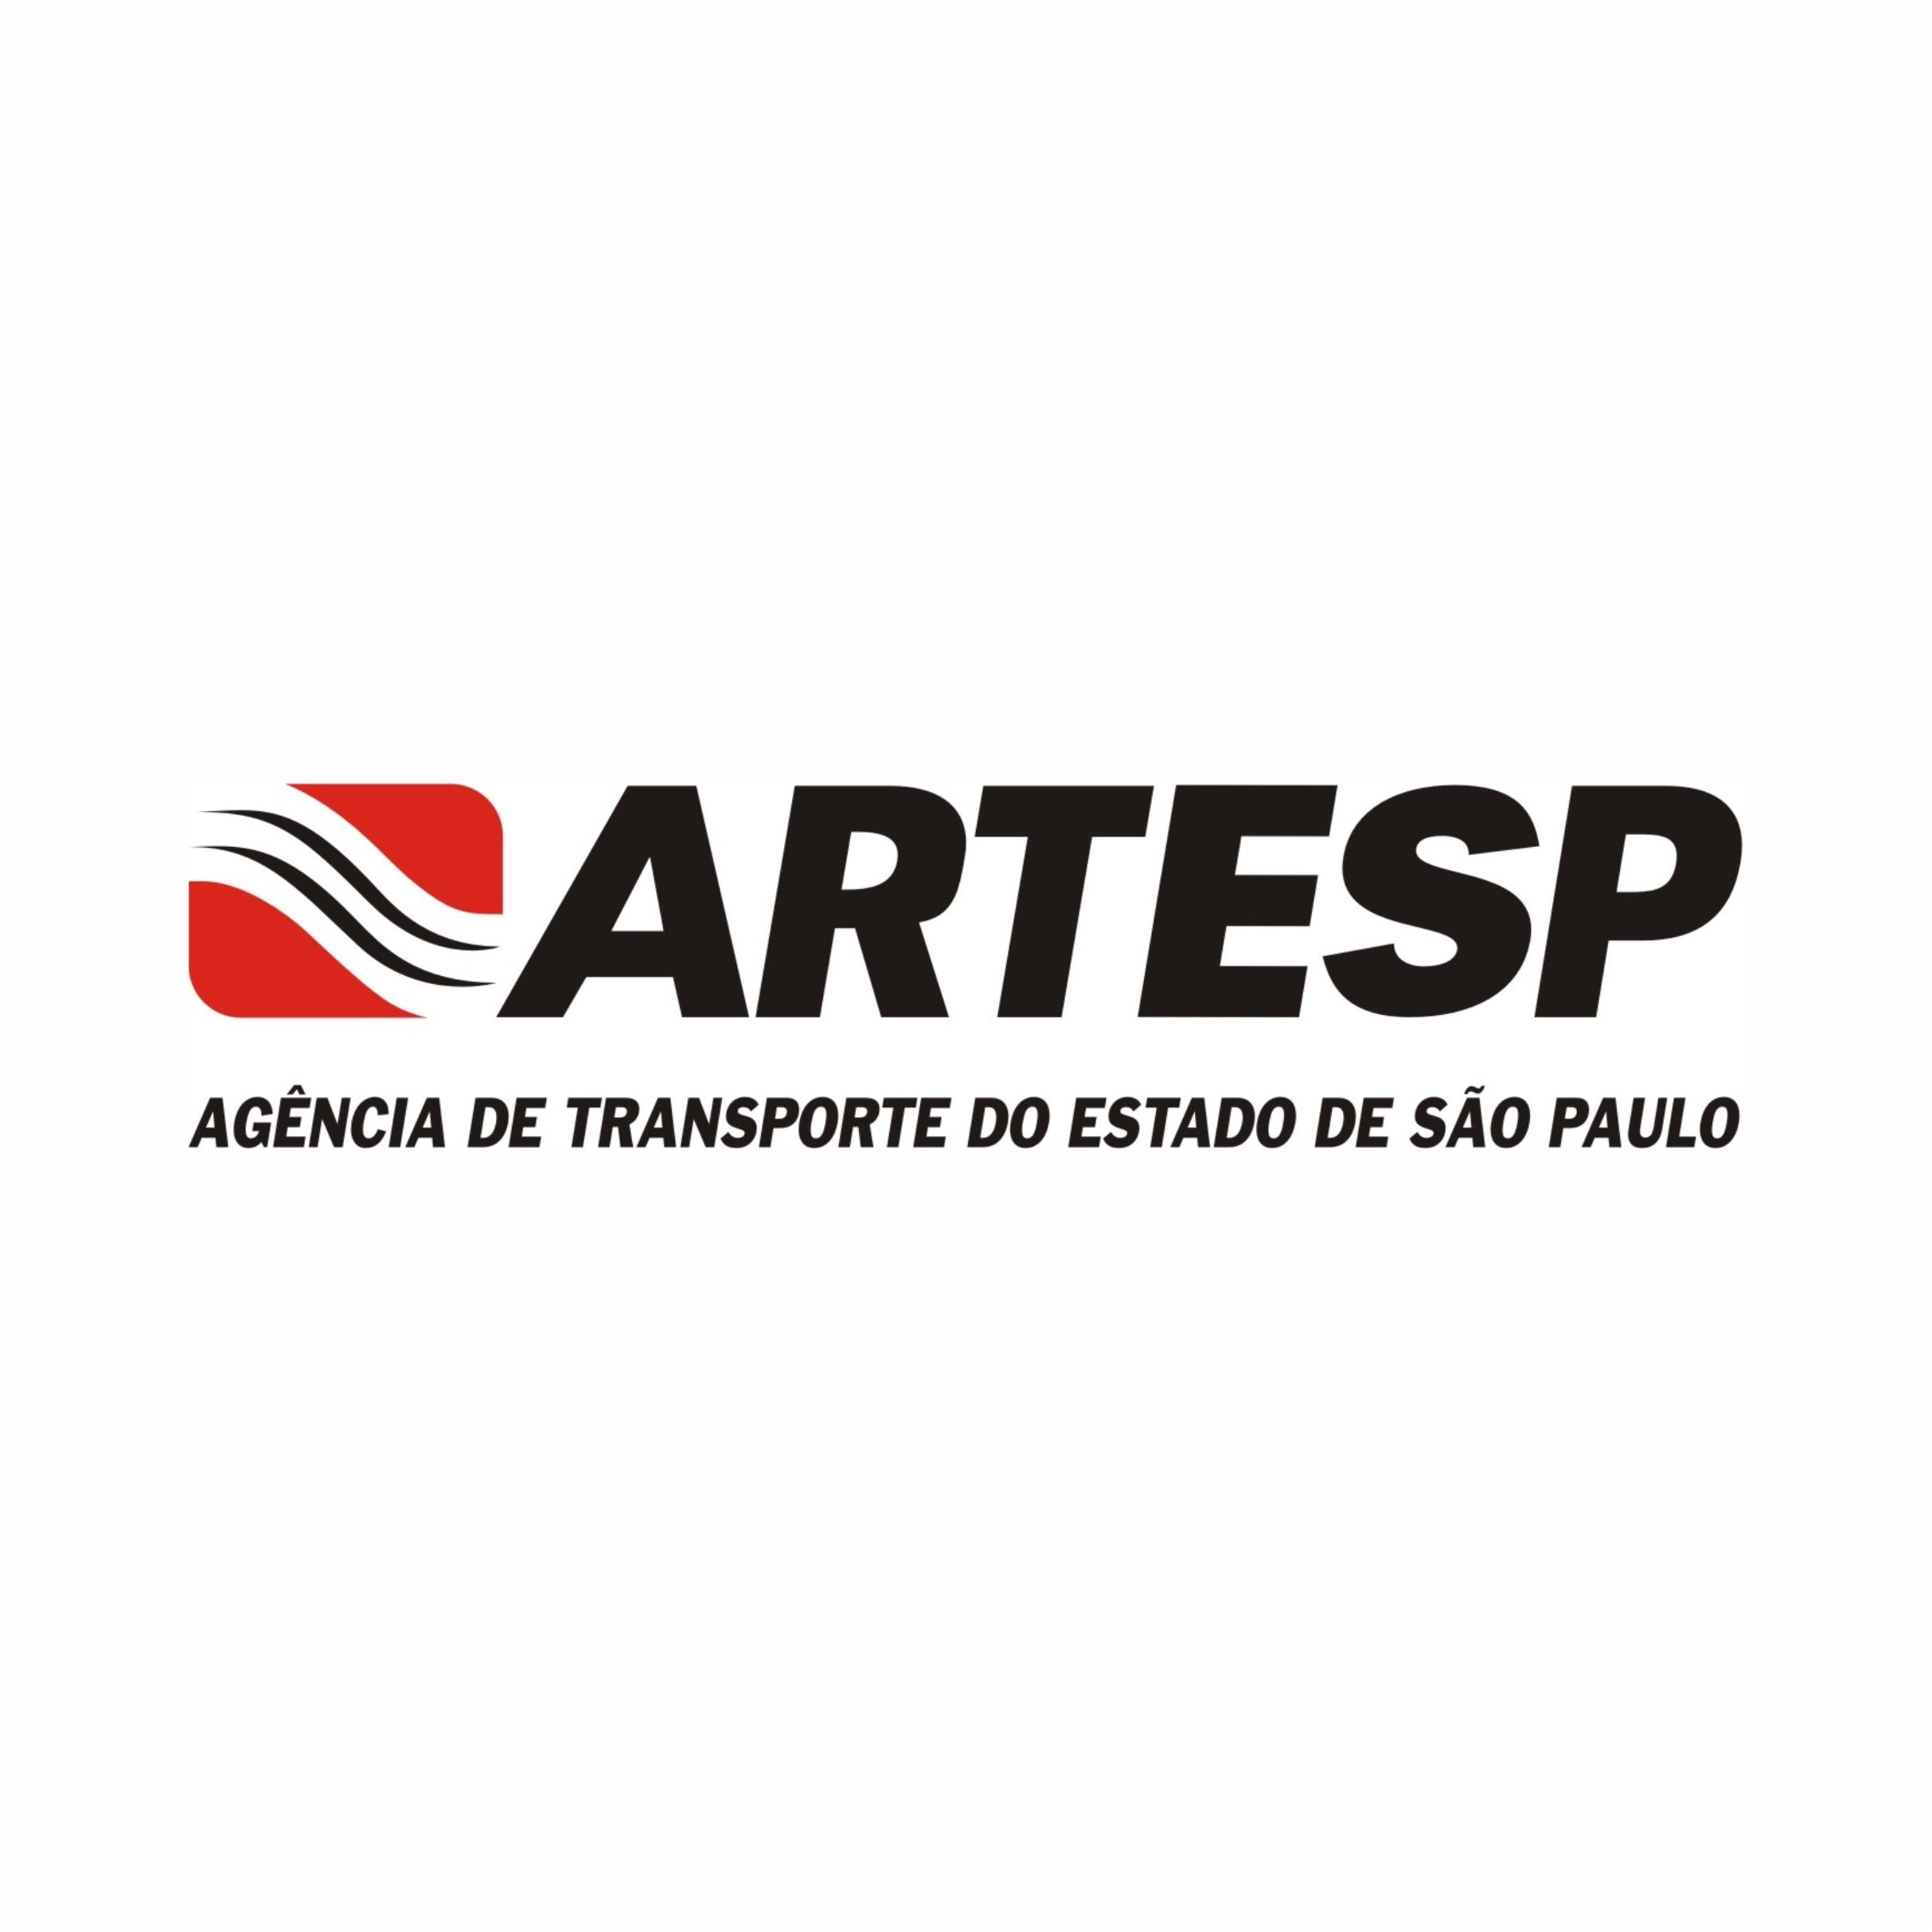 Artesp